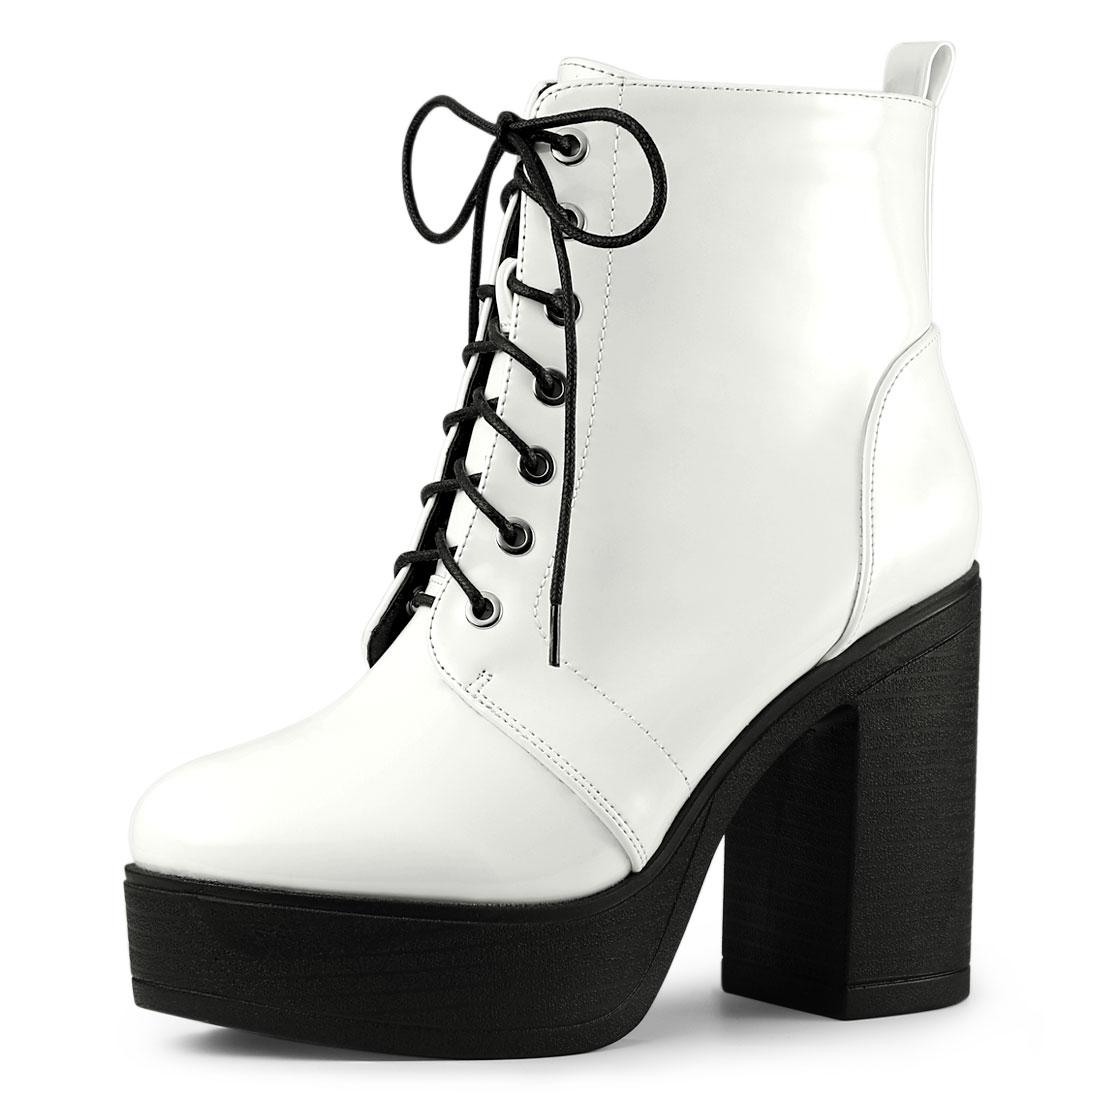 Allegra K Women's Platform Chunky High Heel Lace Up Combat Boots White US 8.5